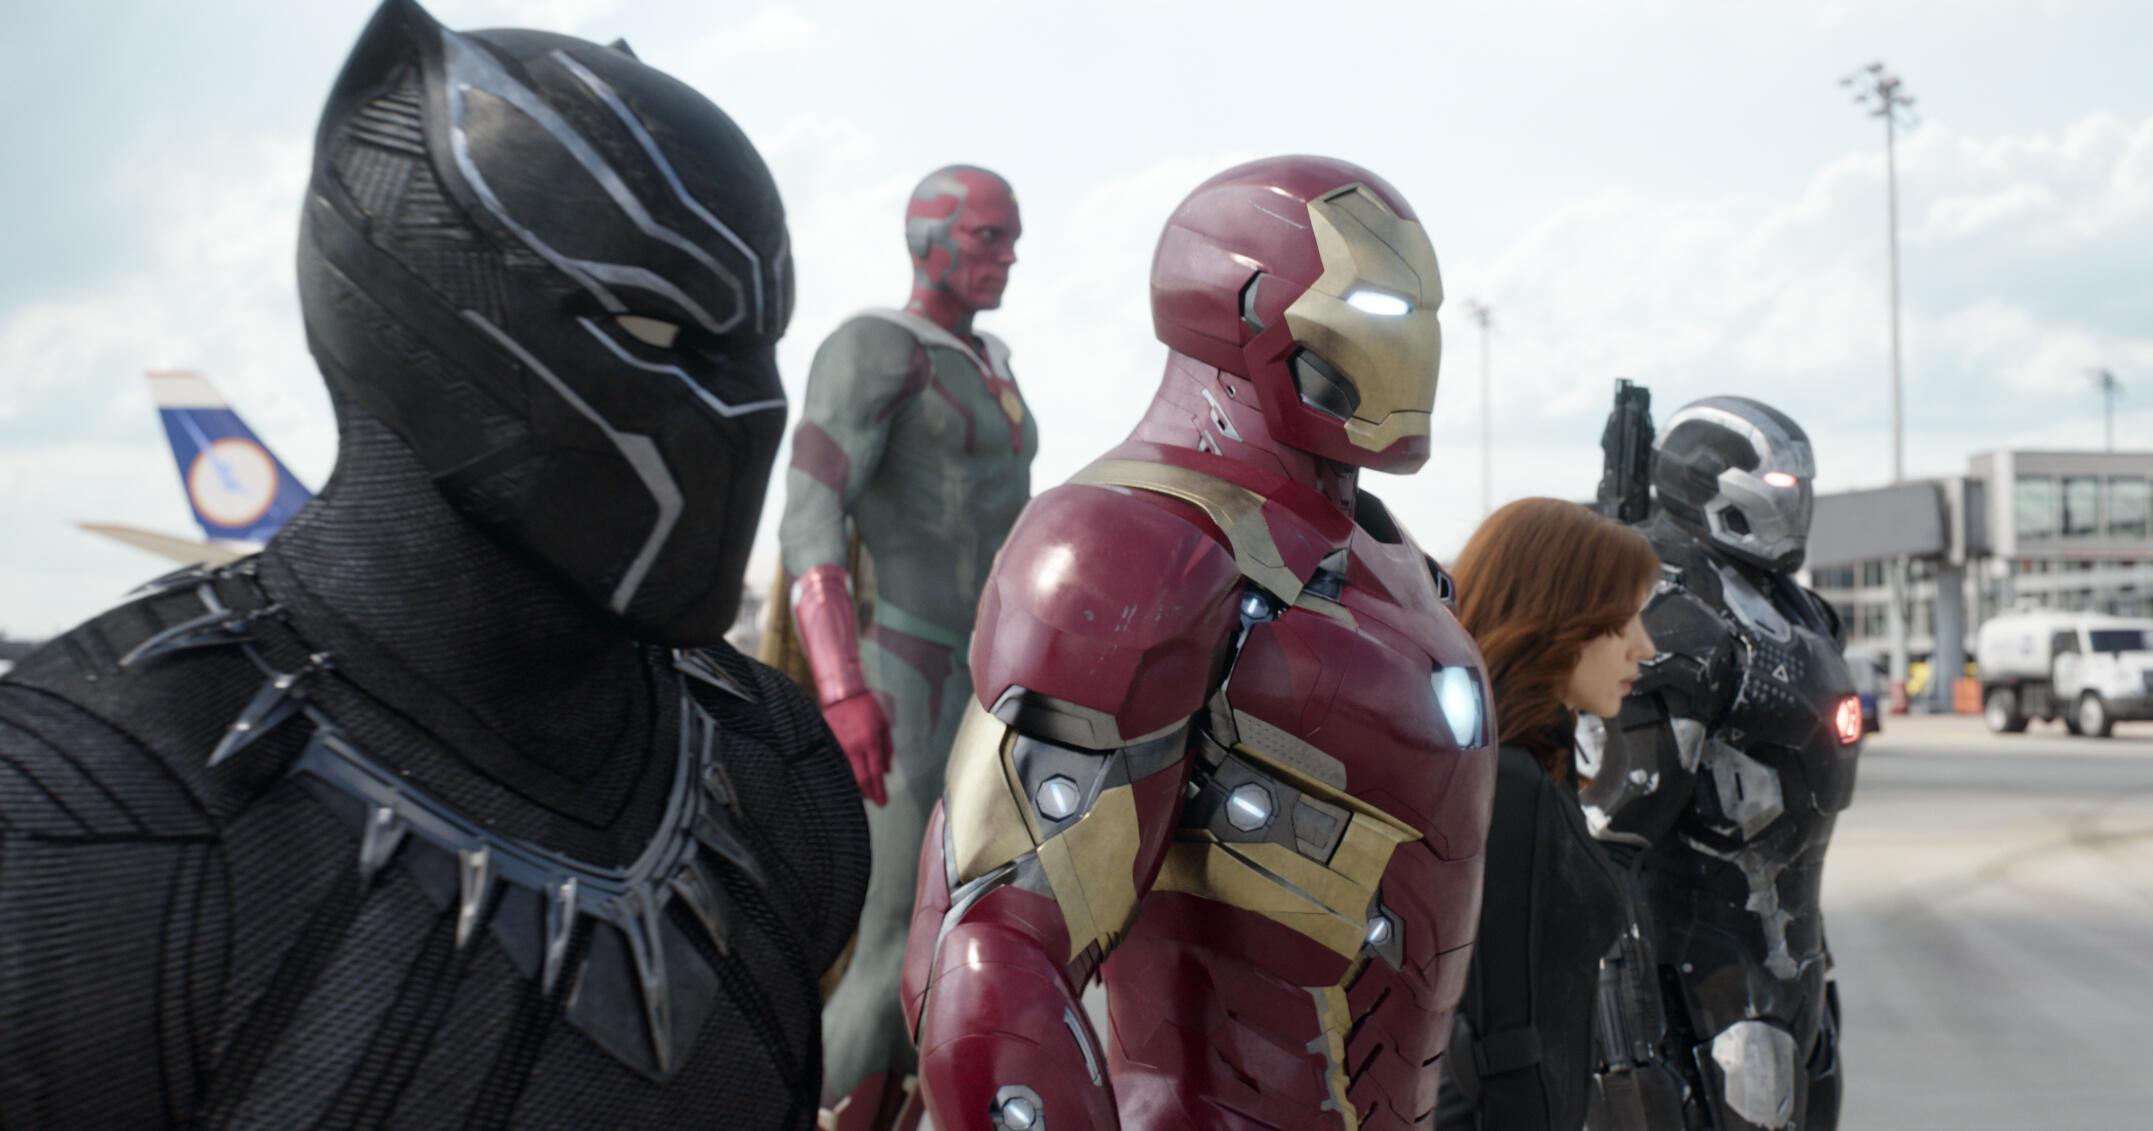 The First Avenger: Civil War Imdb